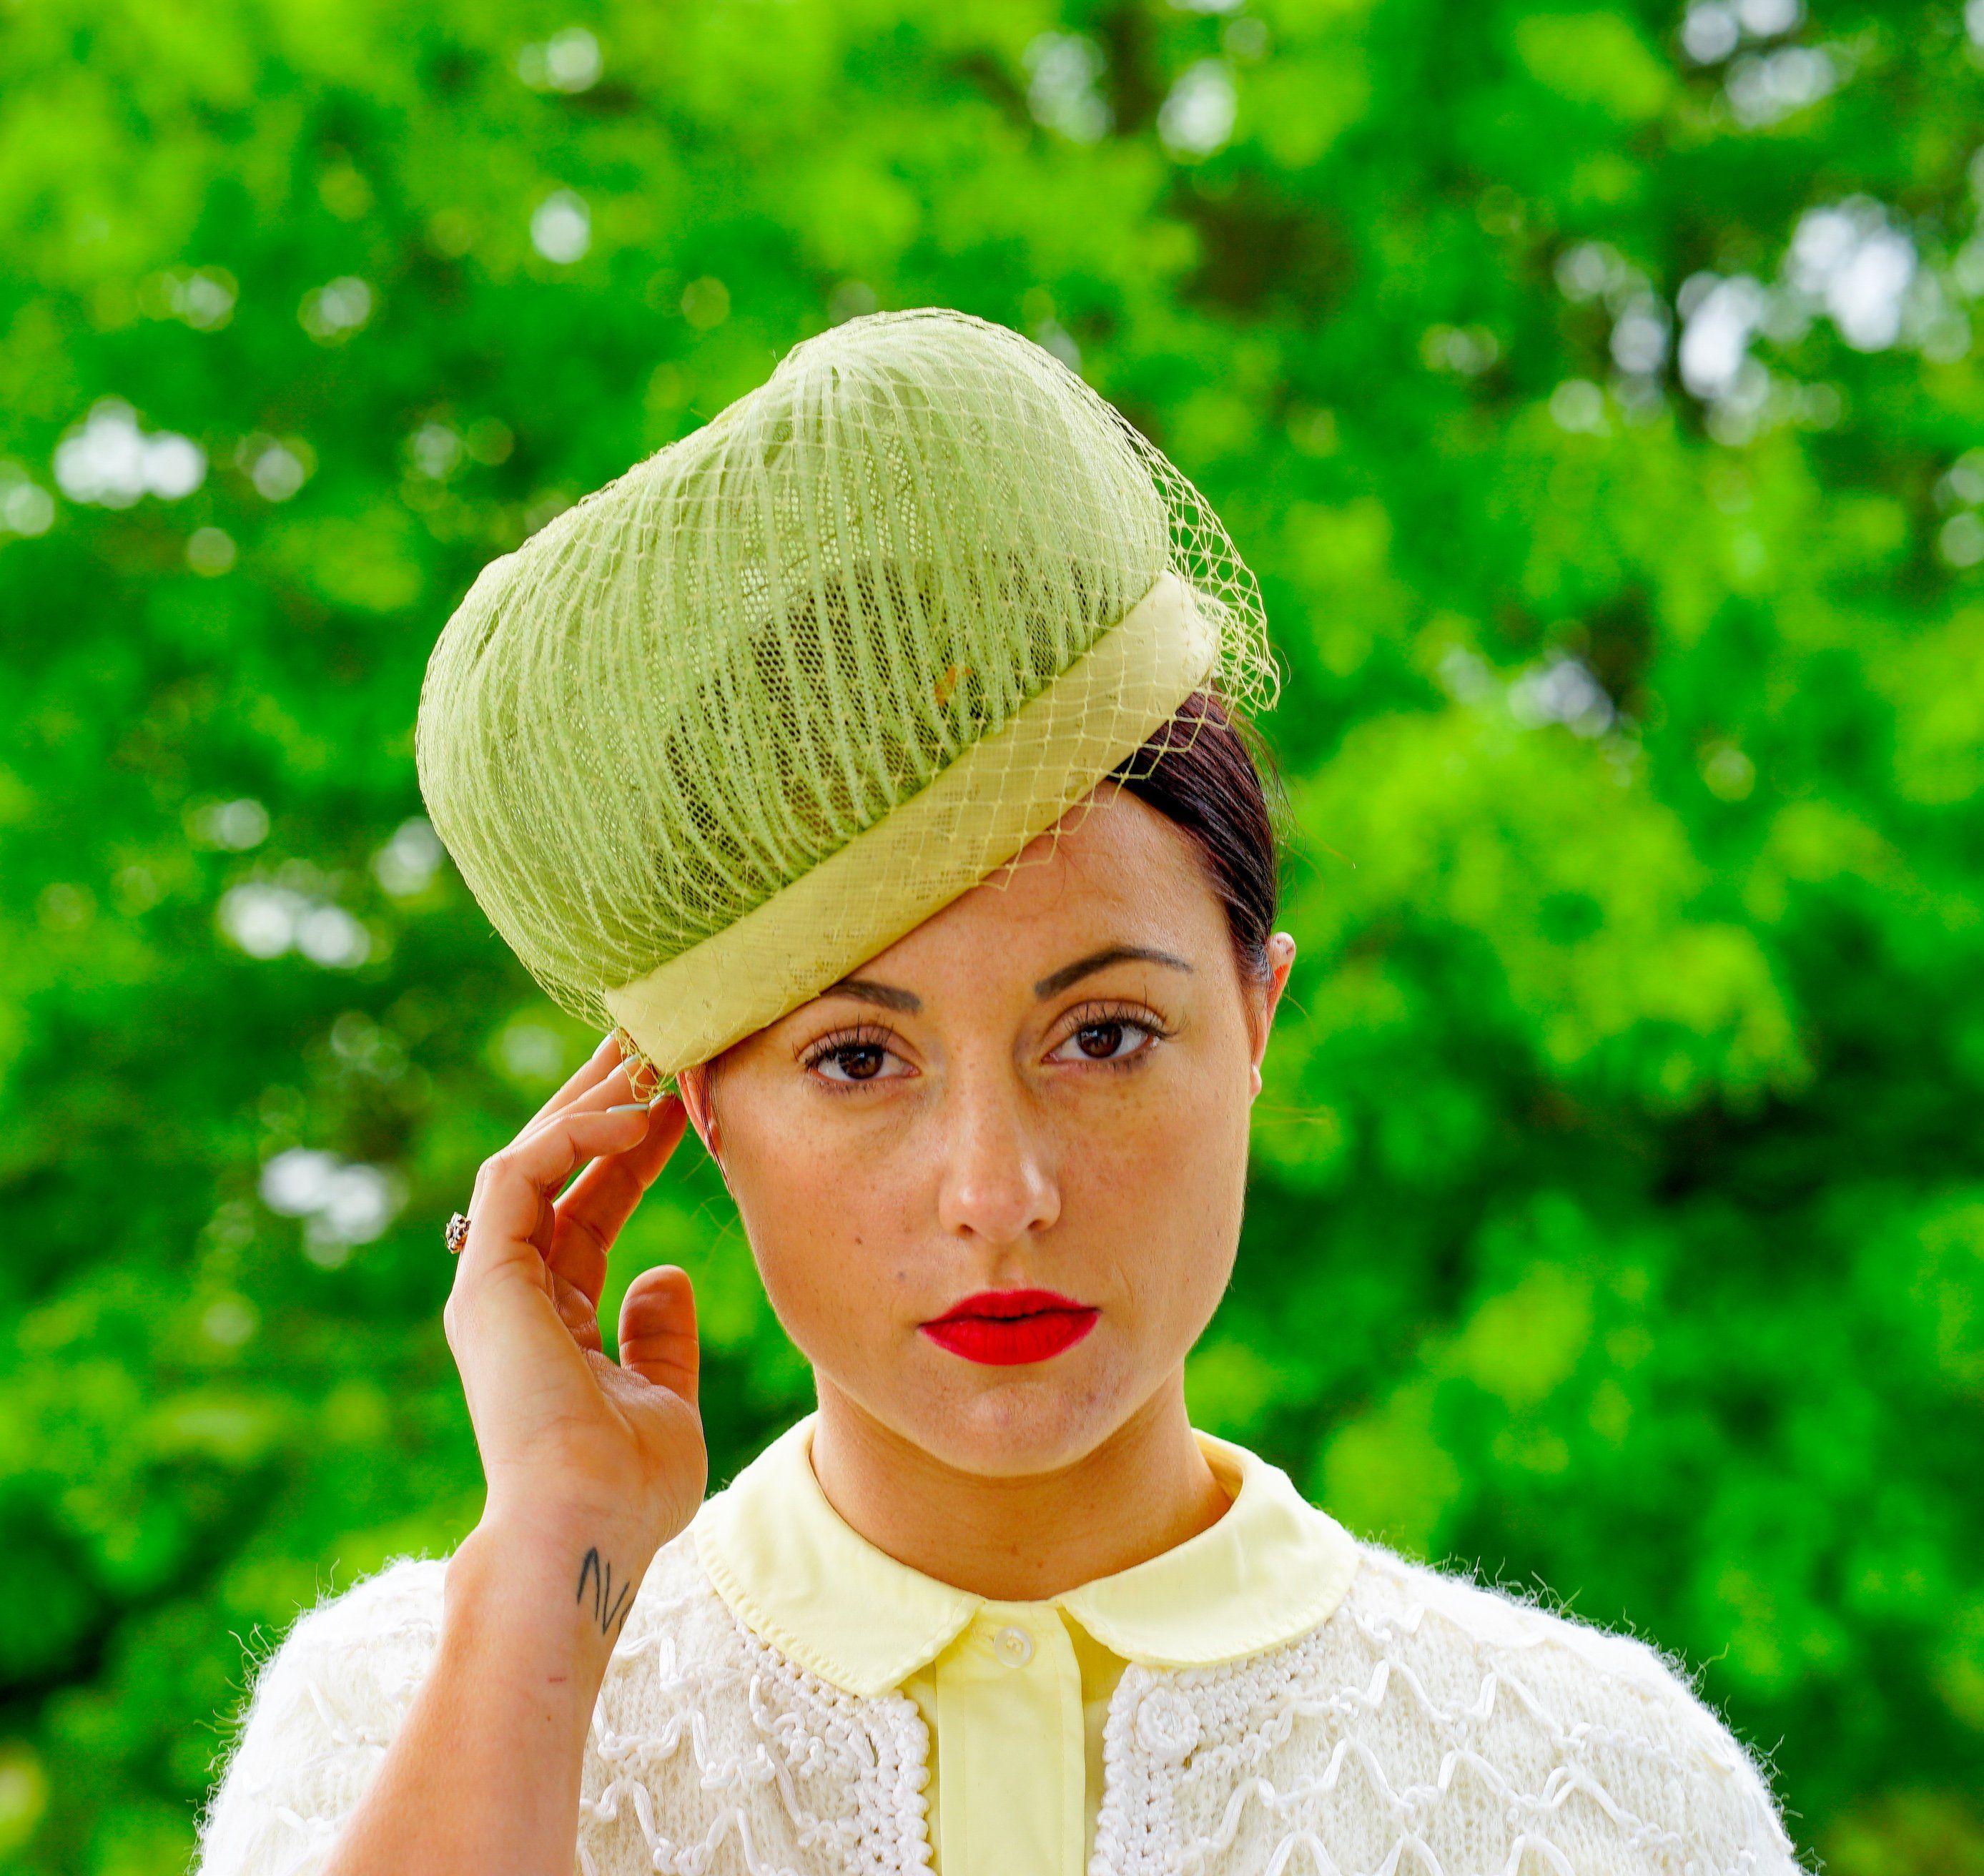 Tea Party Hat Vintage Hat Vintage Millinery Wedding Hat Vintage Red Pillbox Hat Made in France 1950s-1960s Hat Kentucky Derby Hat